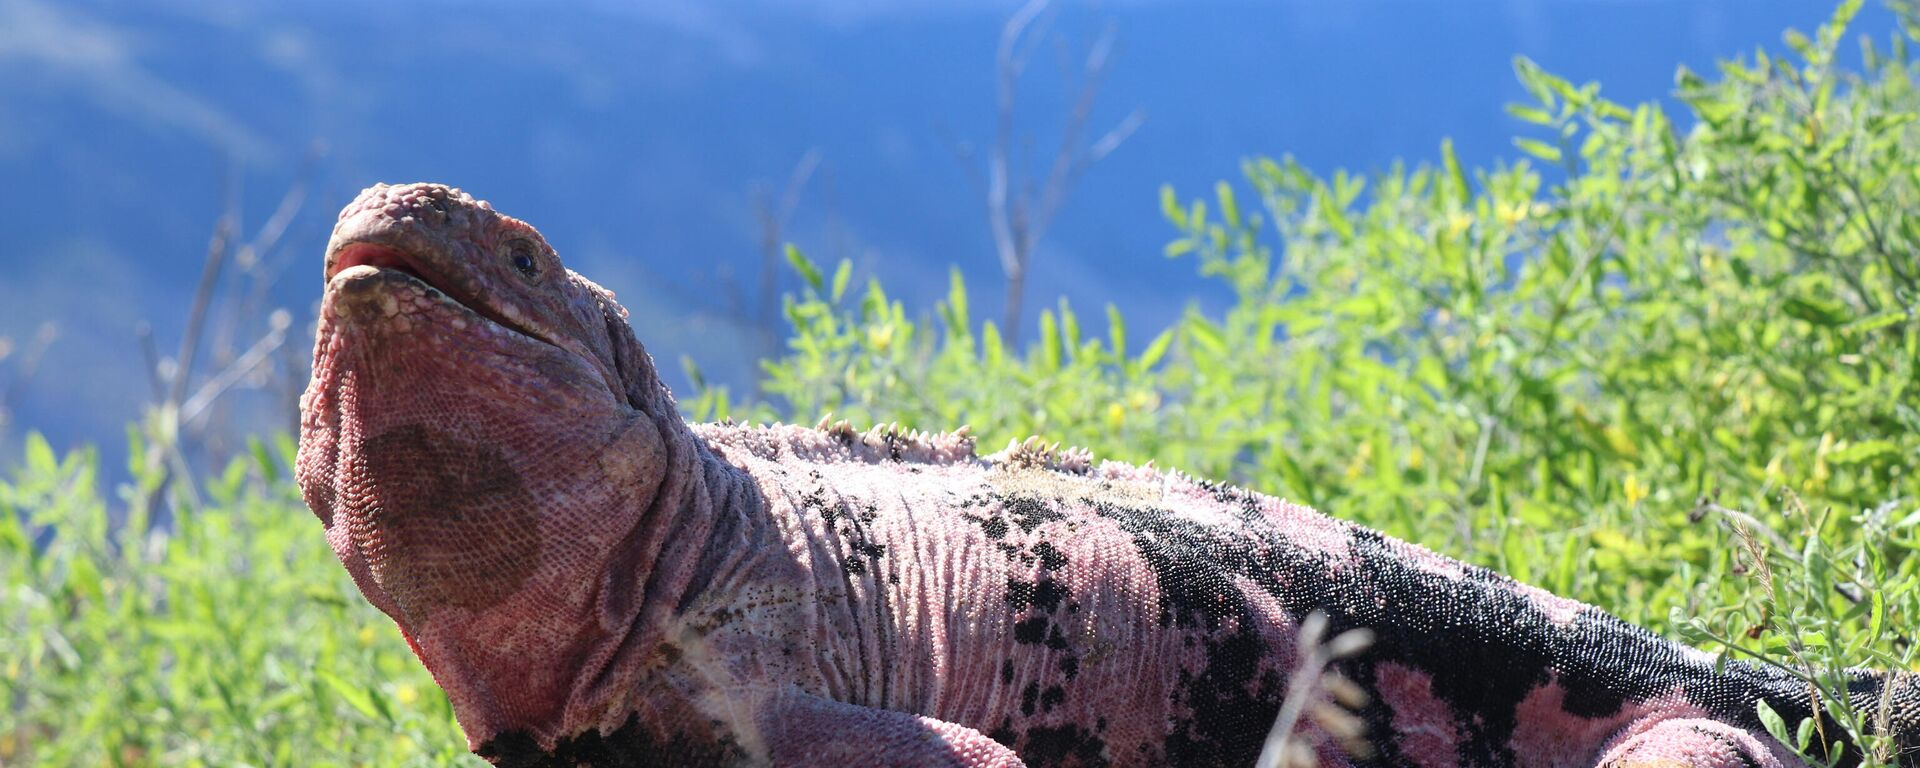 Una iguana rosada, Conolophus marthae - Sputnik Mundo, 1920, 27.08.2021